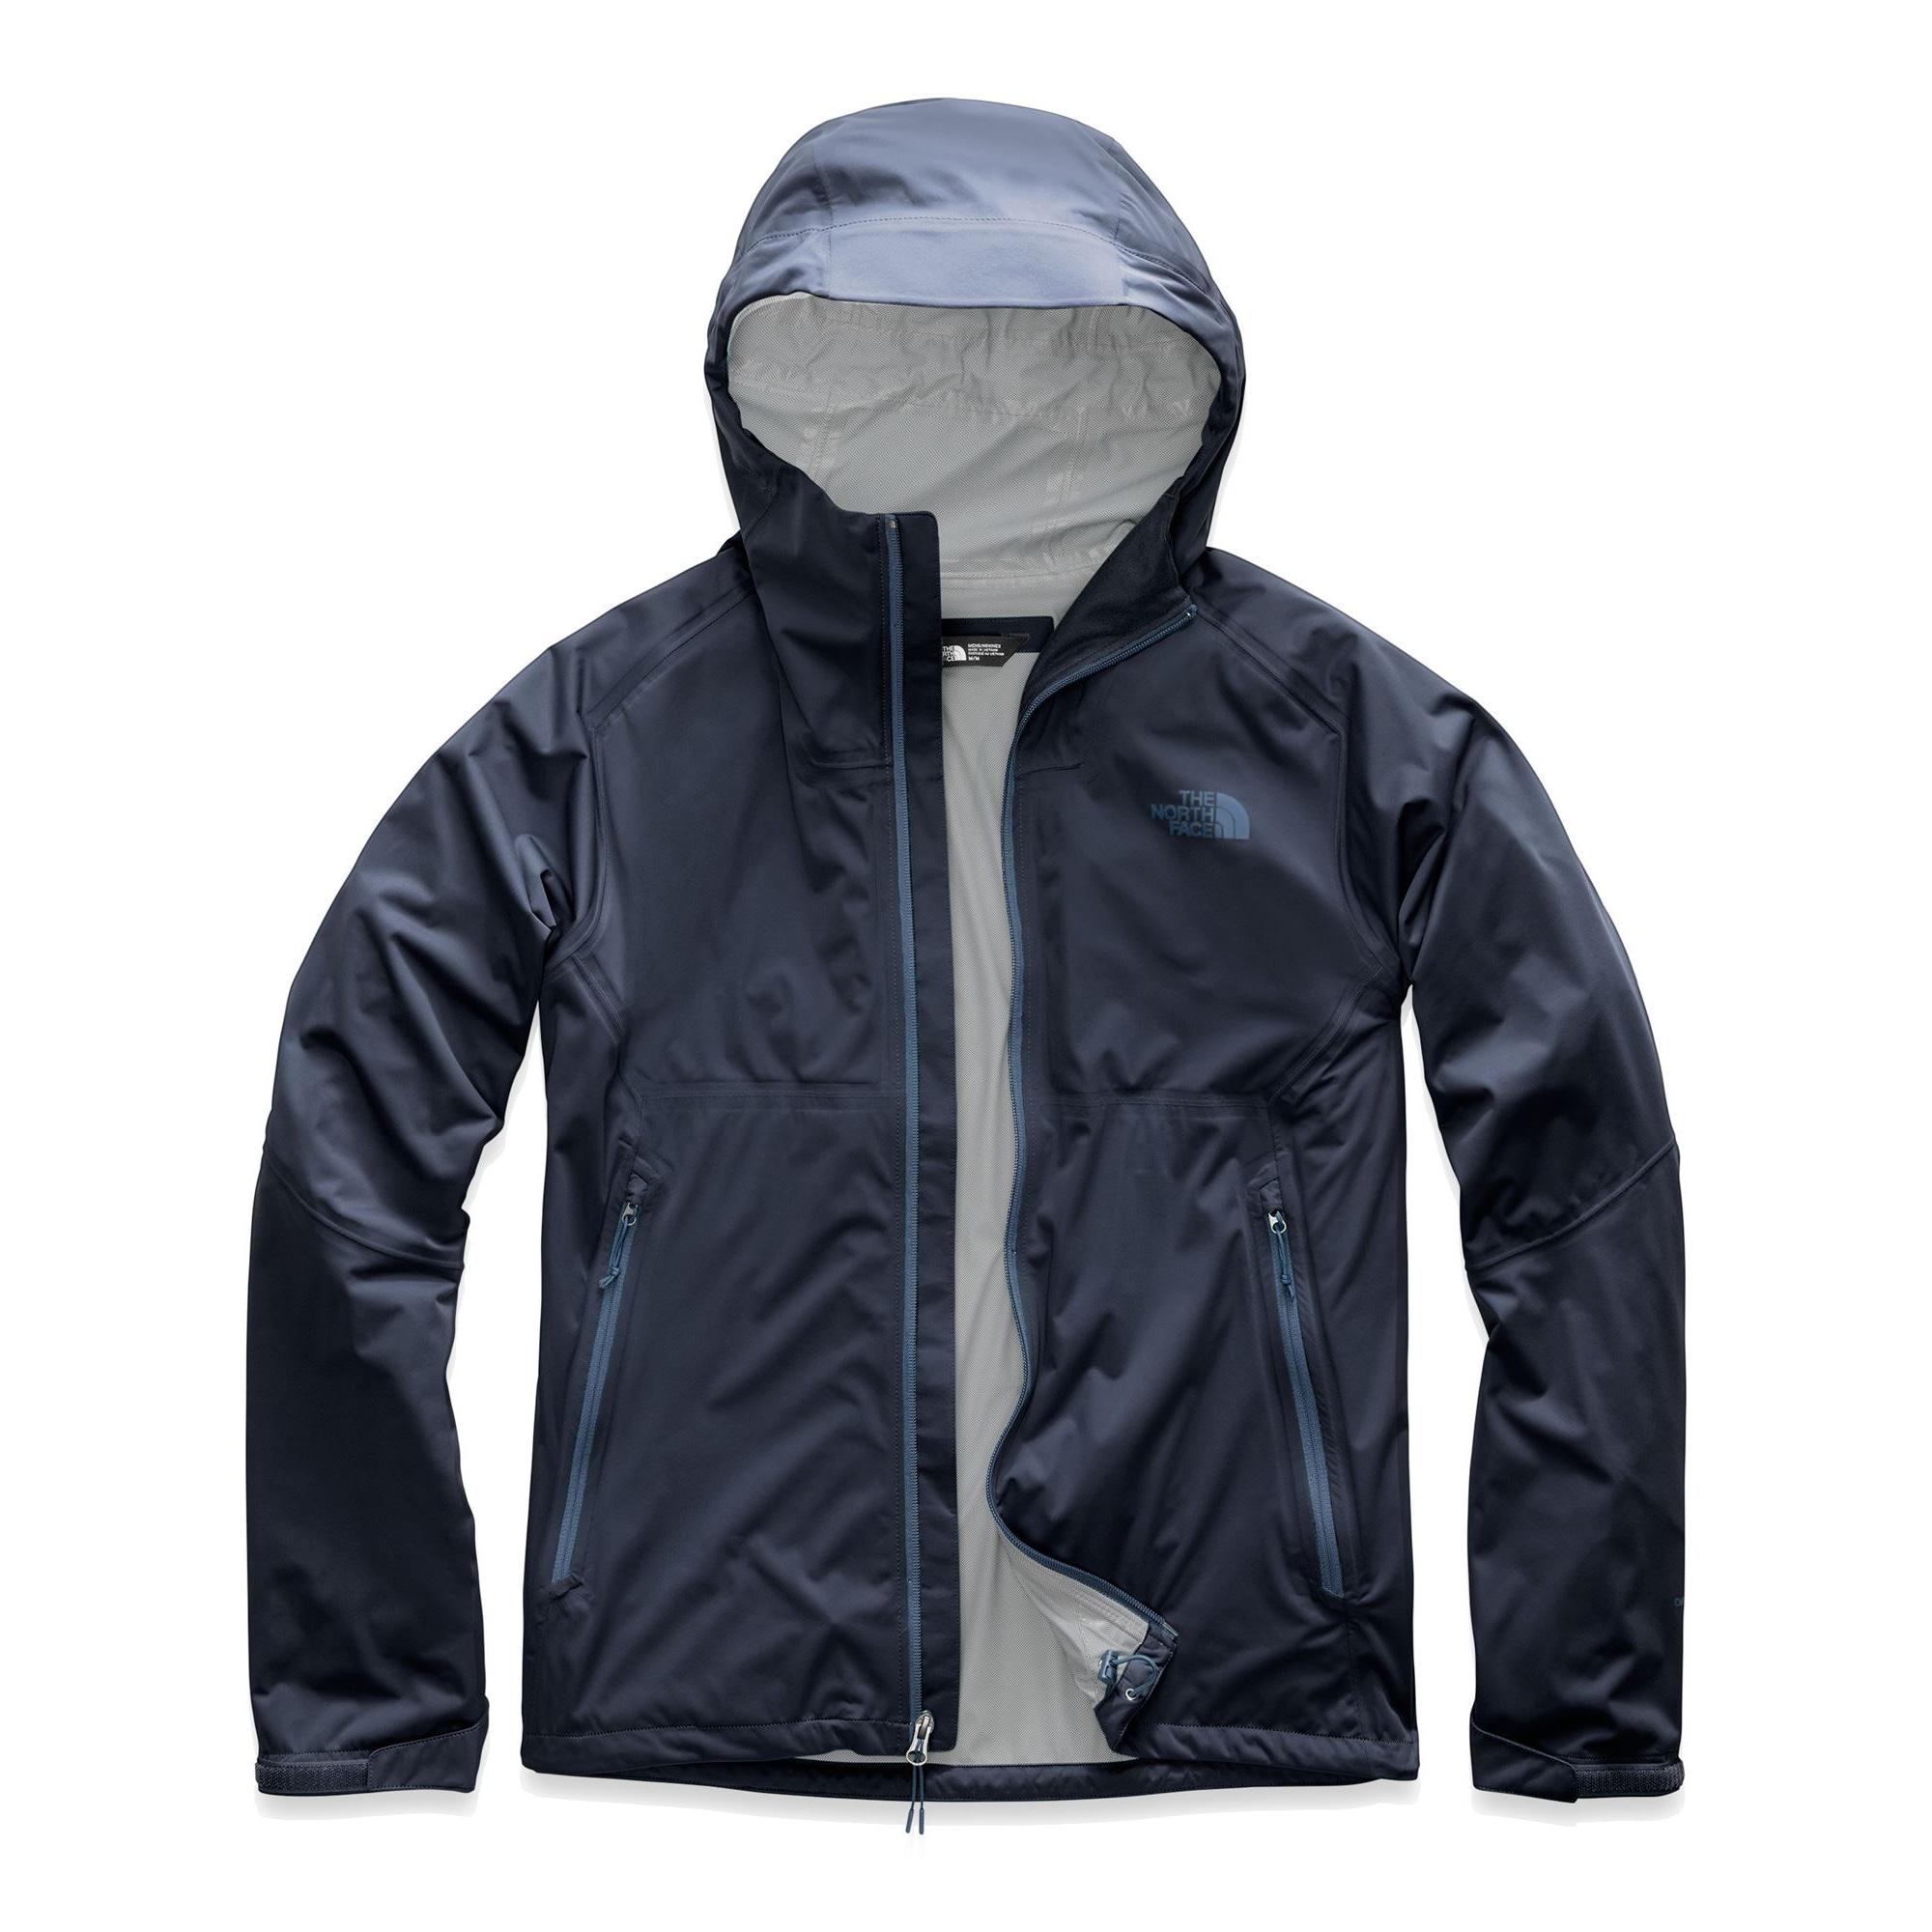 Allproof Stretch Jacket - Men's